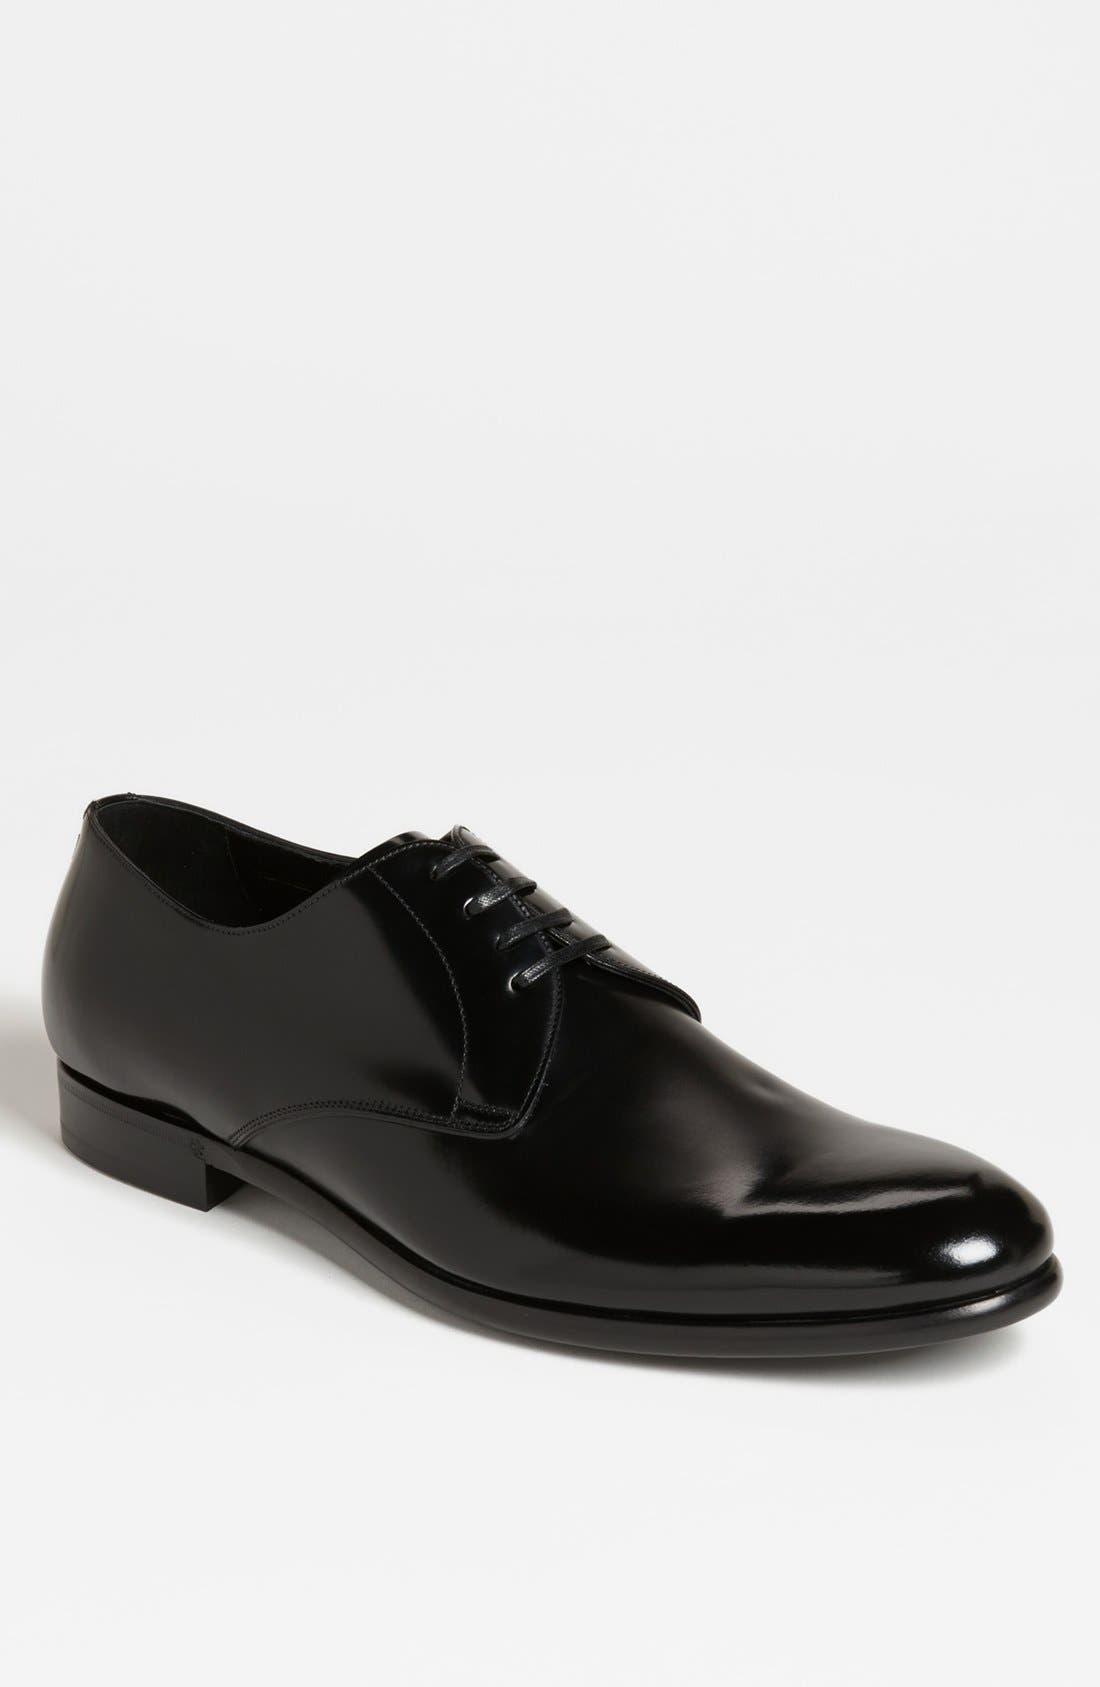 Main Image - Dolce&Gabbana 'Napoli' Plain Toe Derby